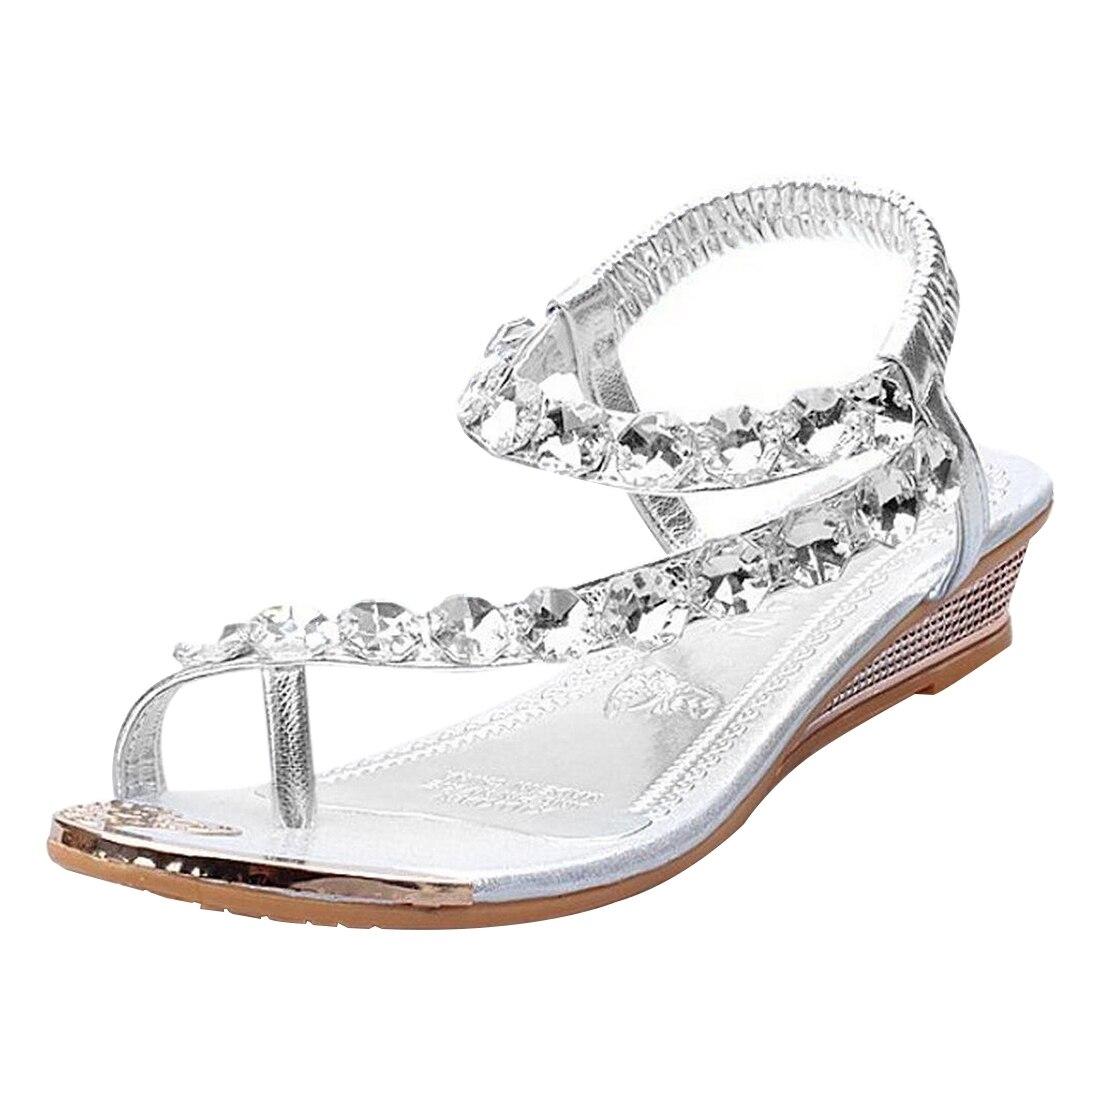 Womens sandals reviews - 1 Pair Womens Sandals Ladies Low Heel Sparkling Shoes Rhinestone Diamante Flip Flops Bling Beading Platform Wedges Sliver